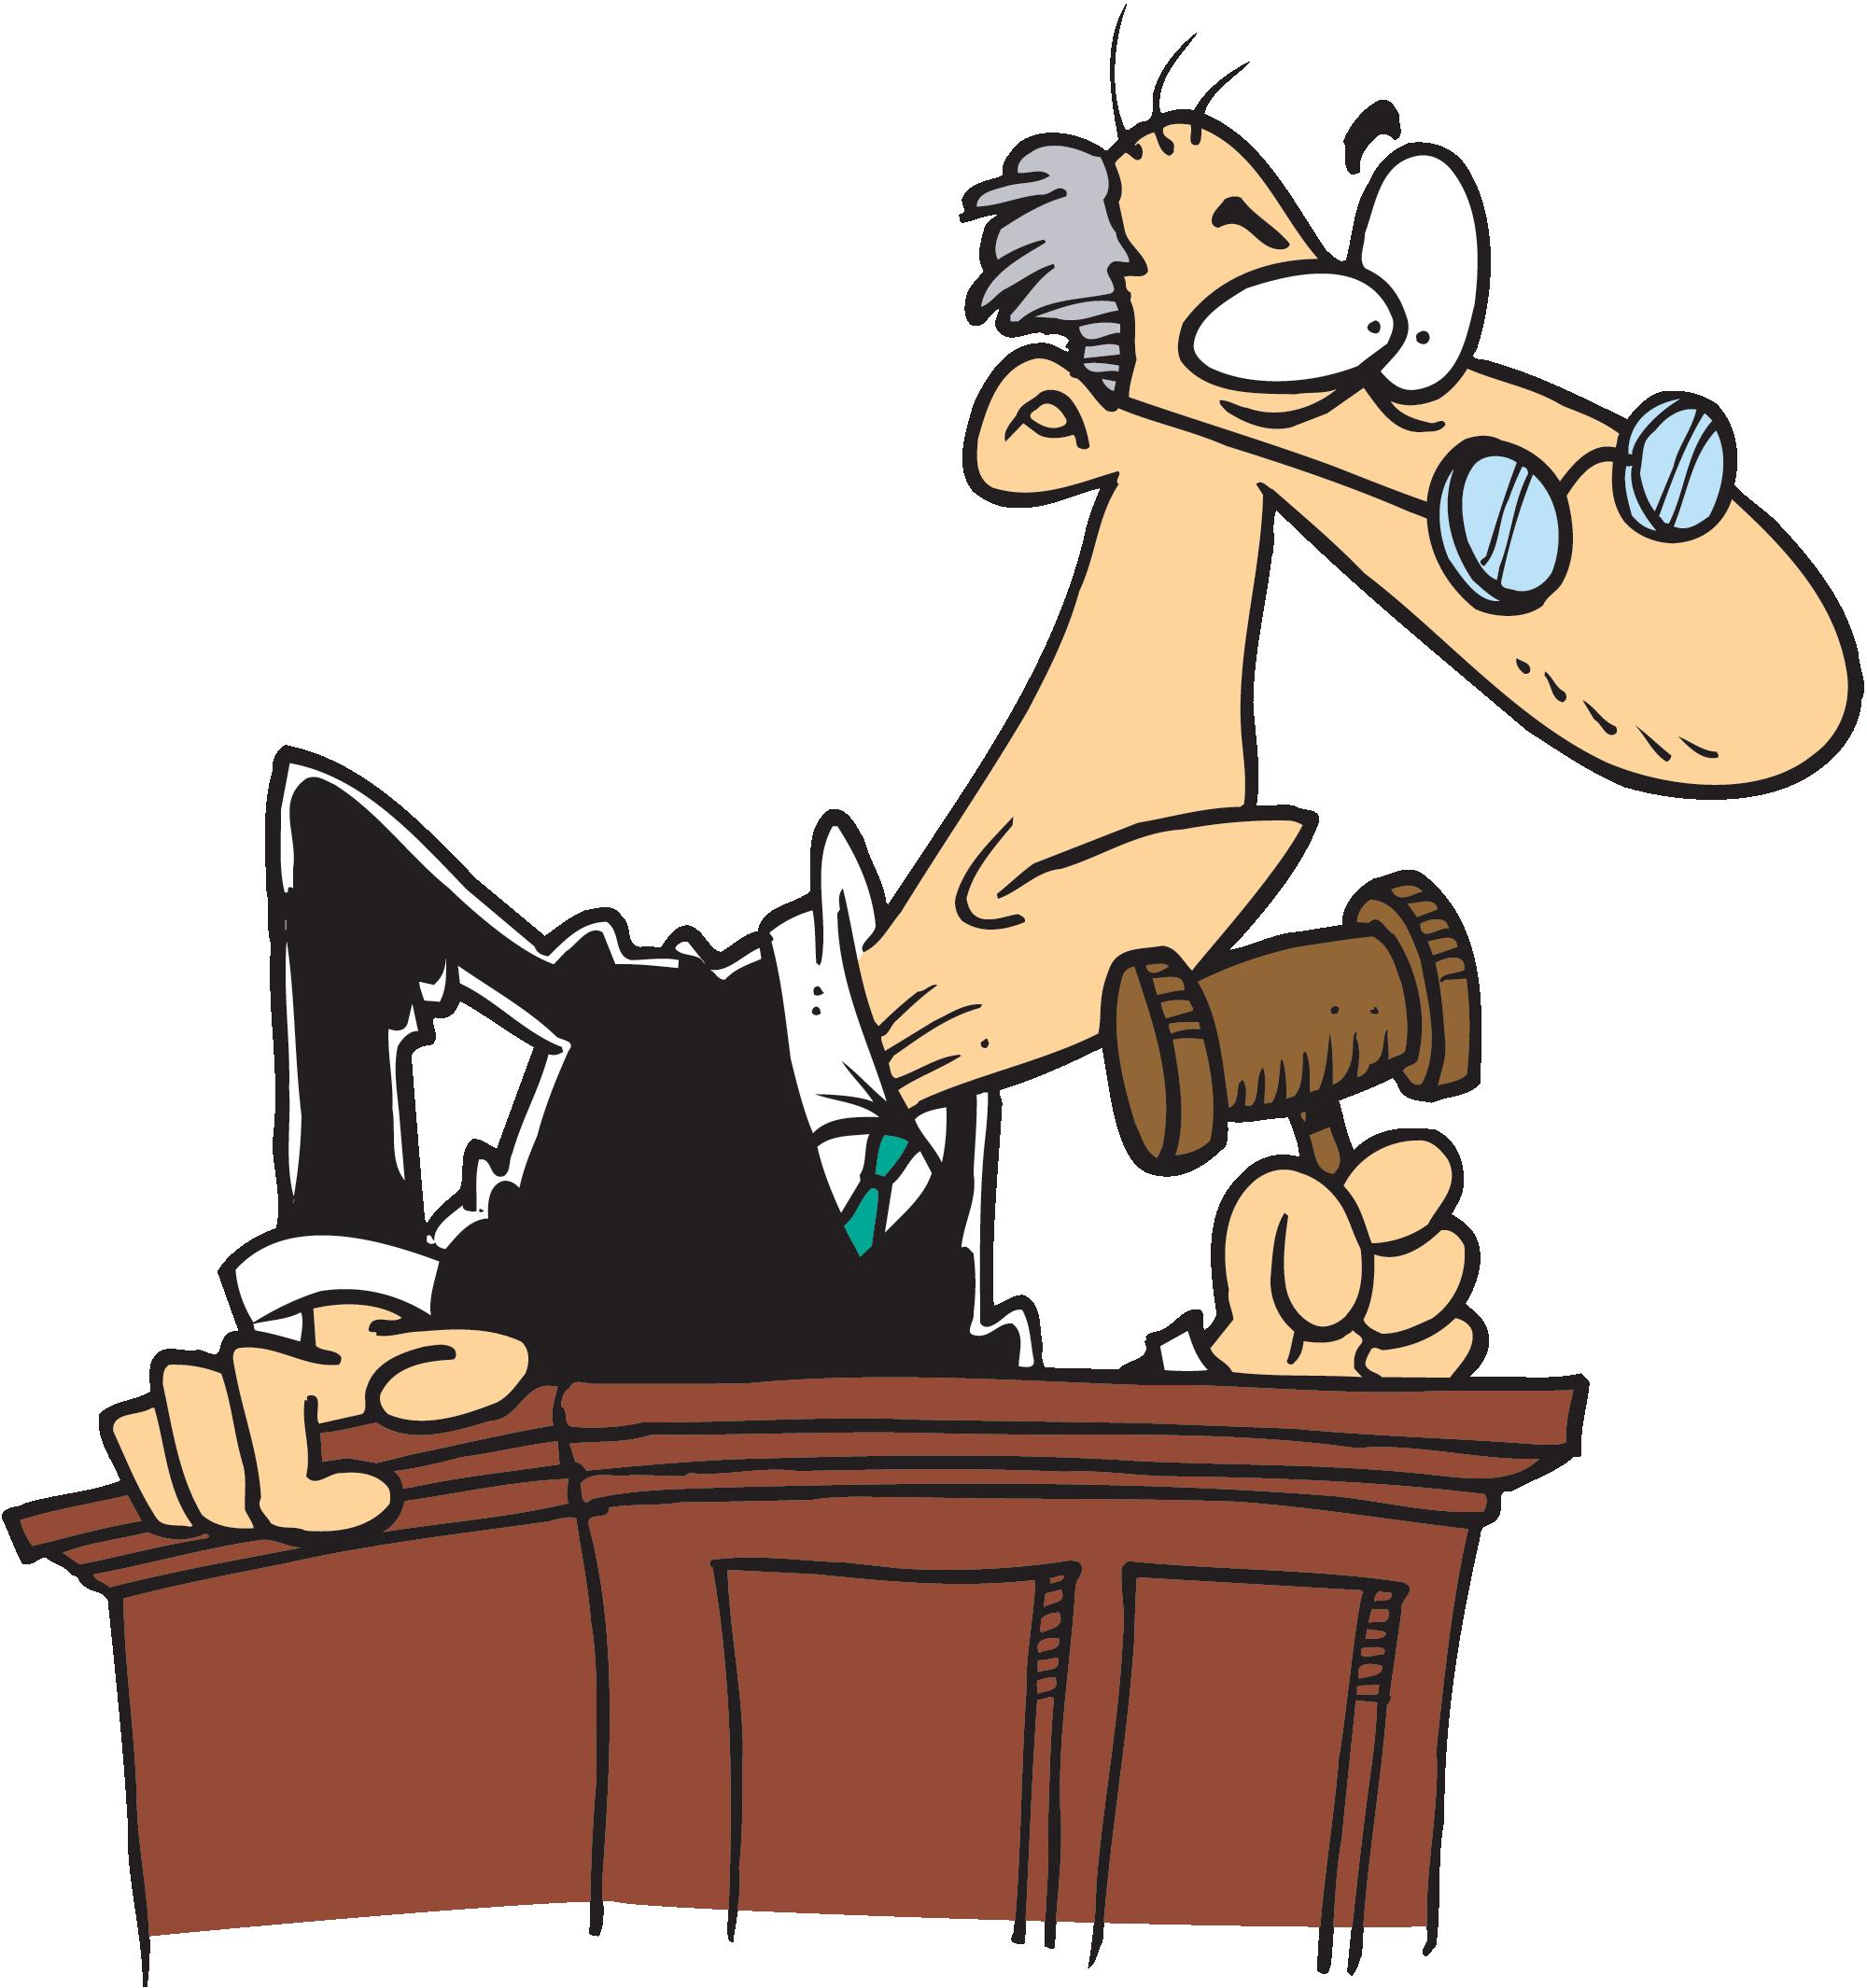 Court clipart decided. Uk high judges rbyehudah